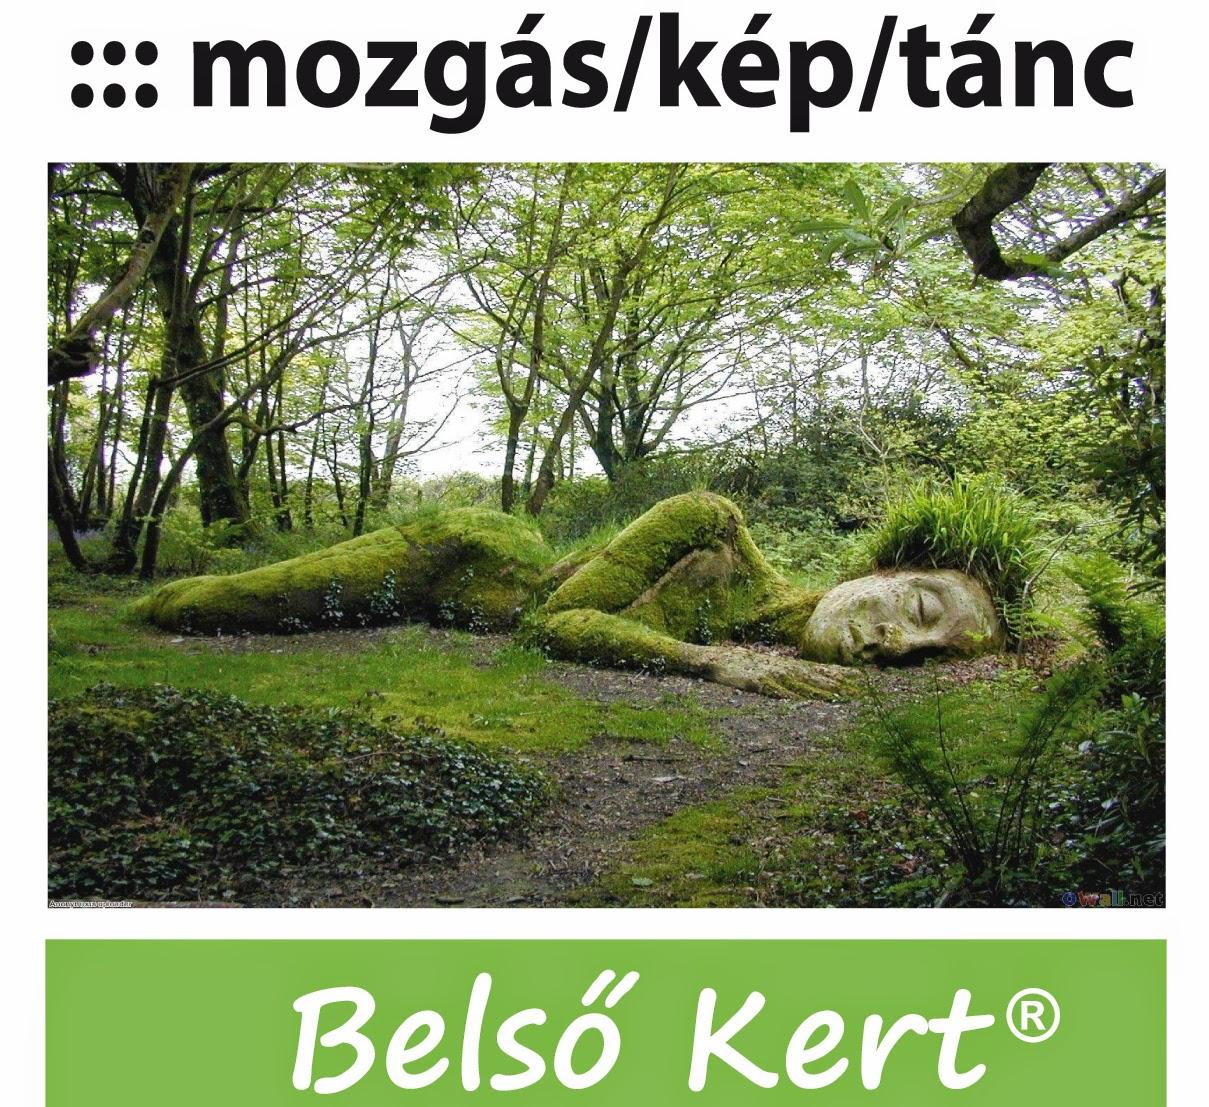 http://www.tancter.hu/2014/08/belso-kert-integralt-kifejezes-es.html